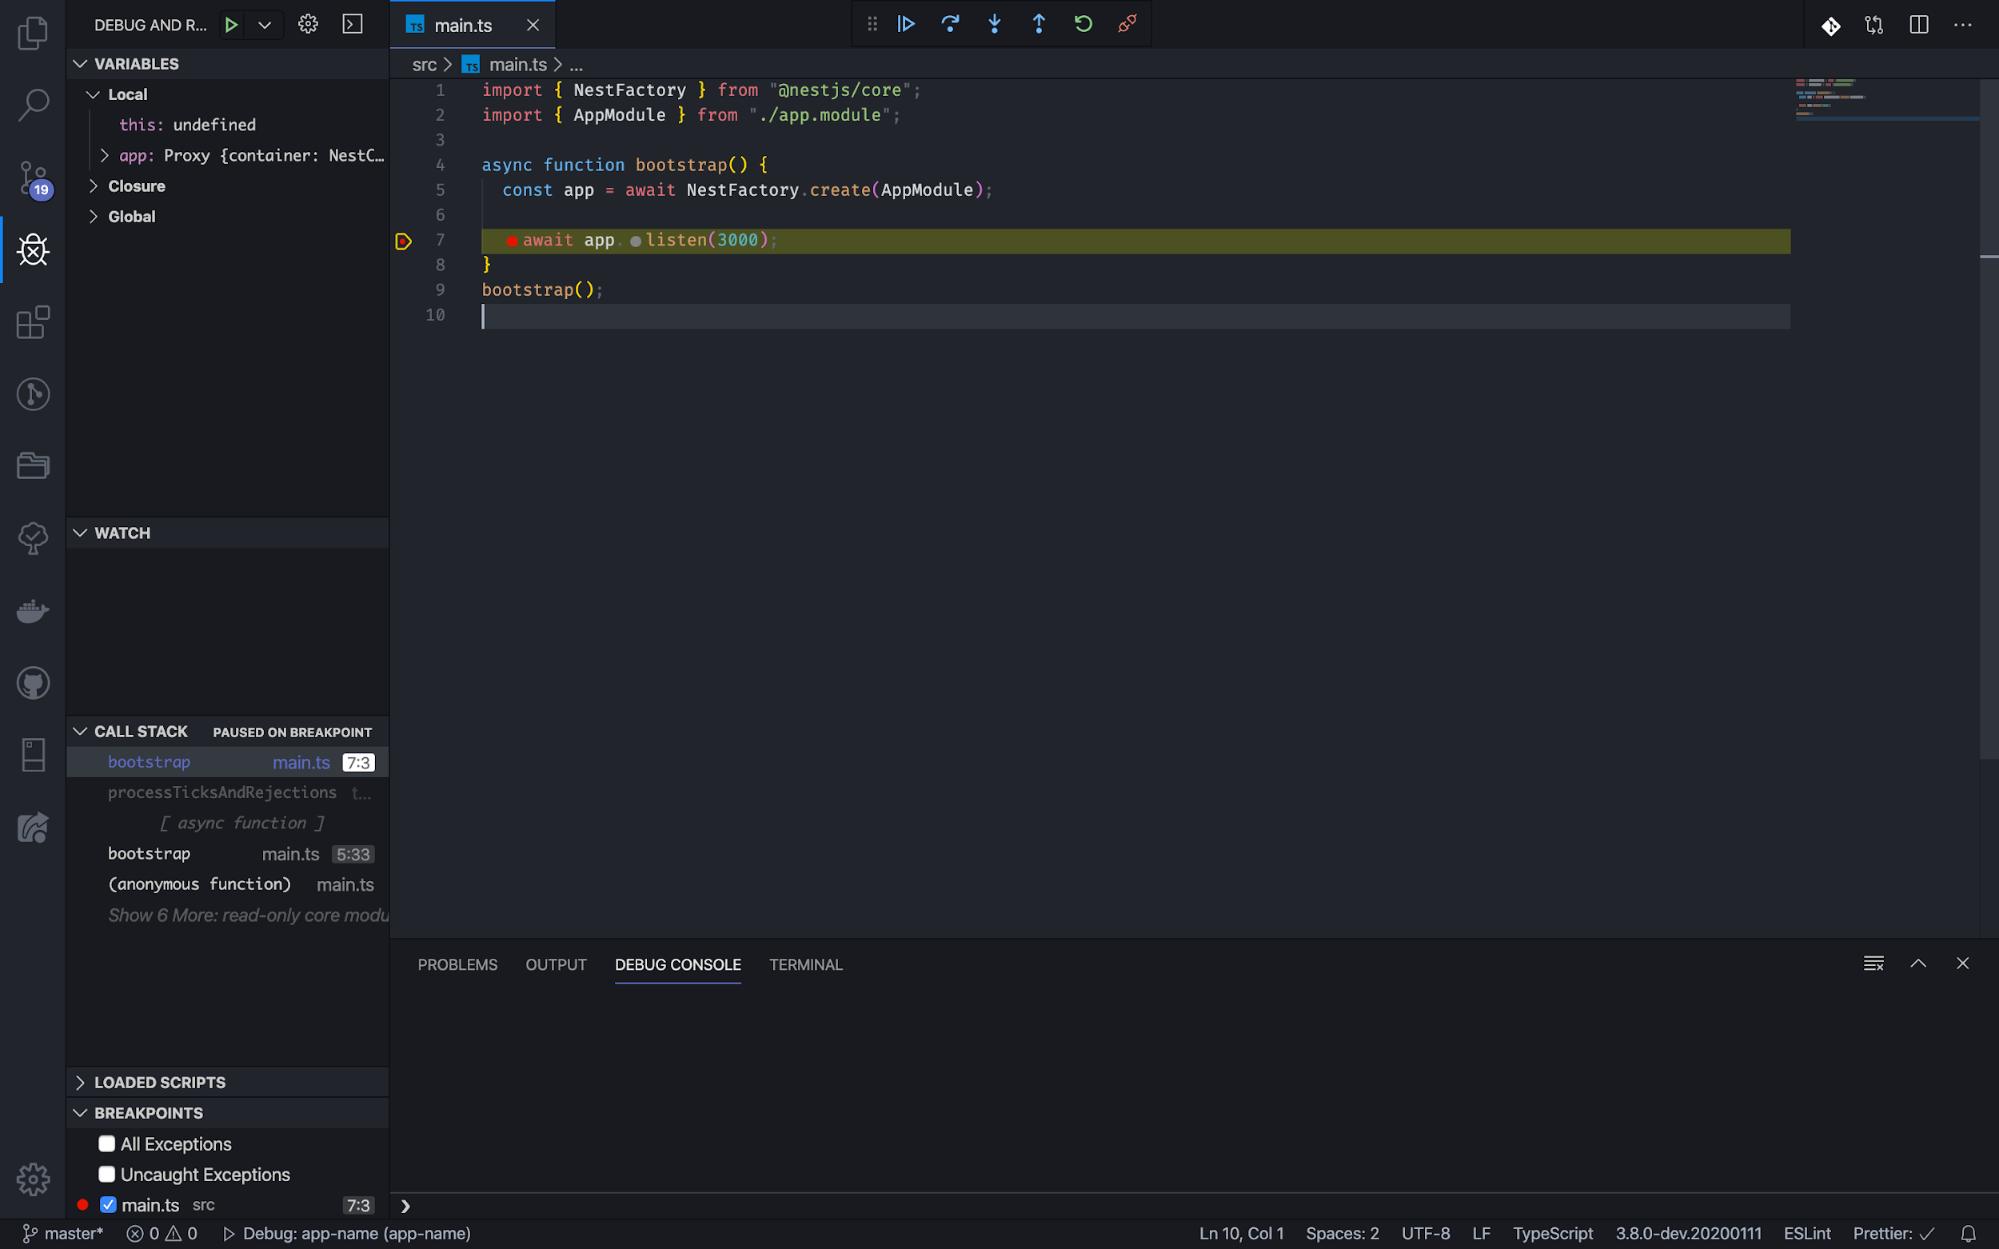 The debugger view in Visual Studio Code